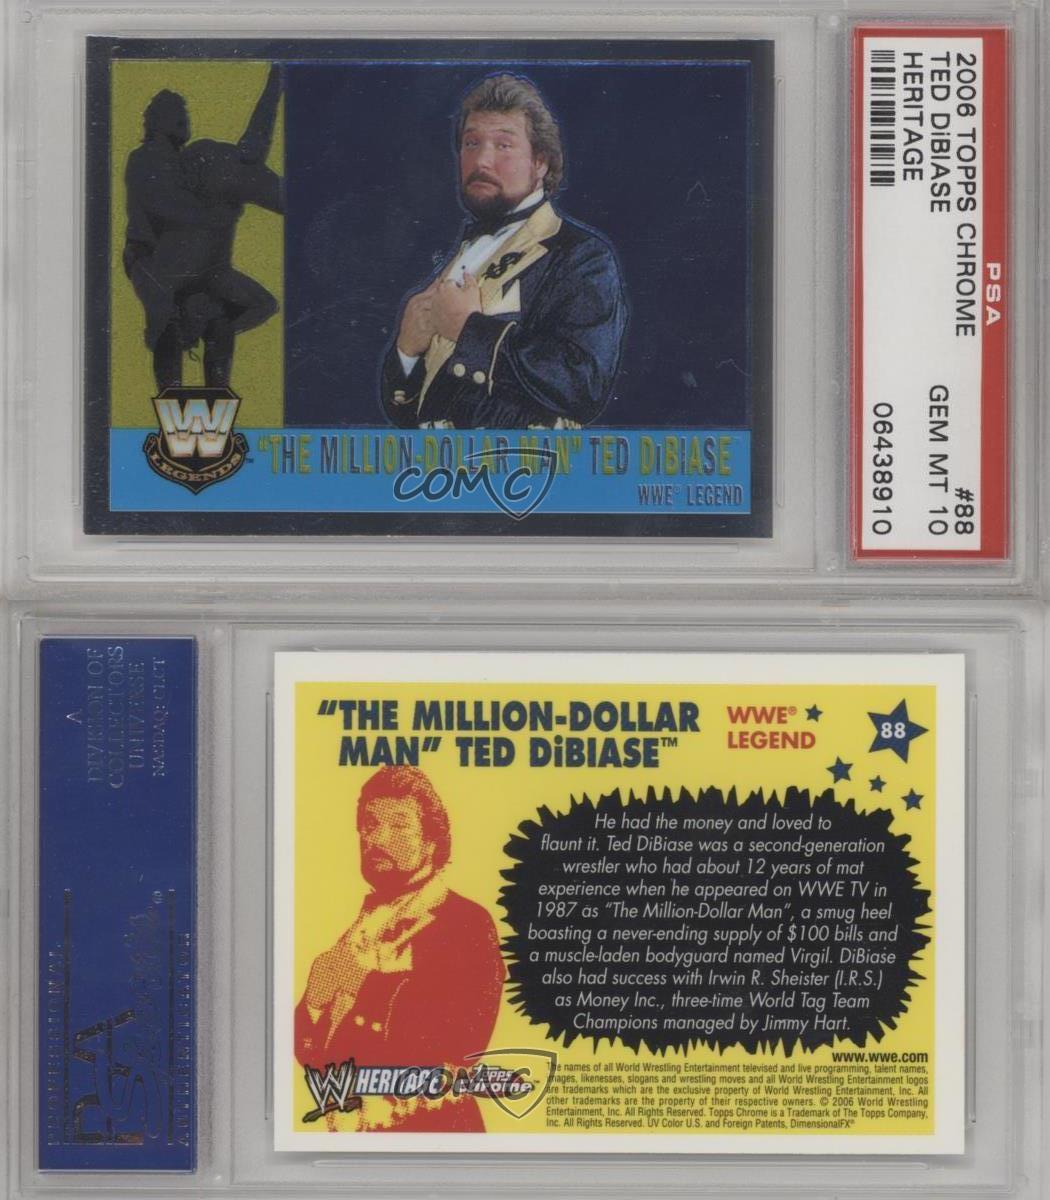 #88 MILLION DOLLAR MAN TED DiBIASE 2005 Topps WWE Heritage I LEGEND